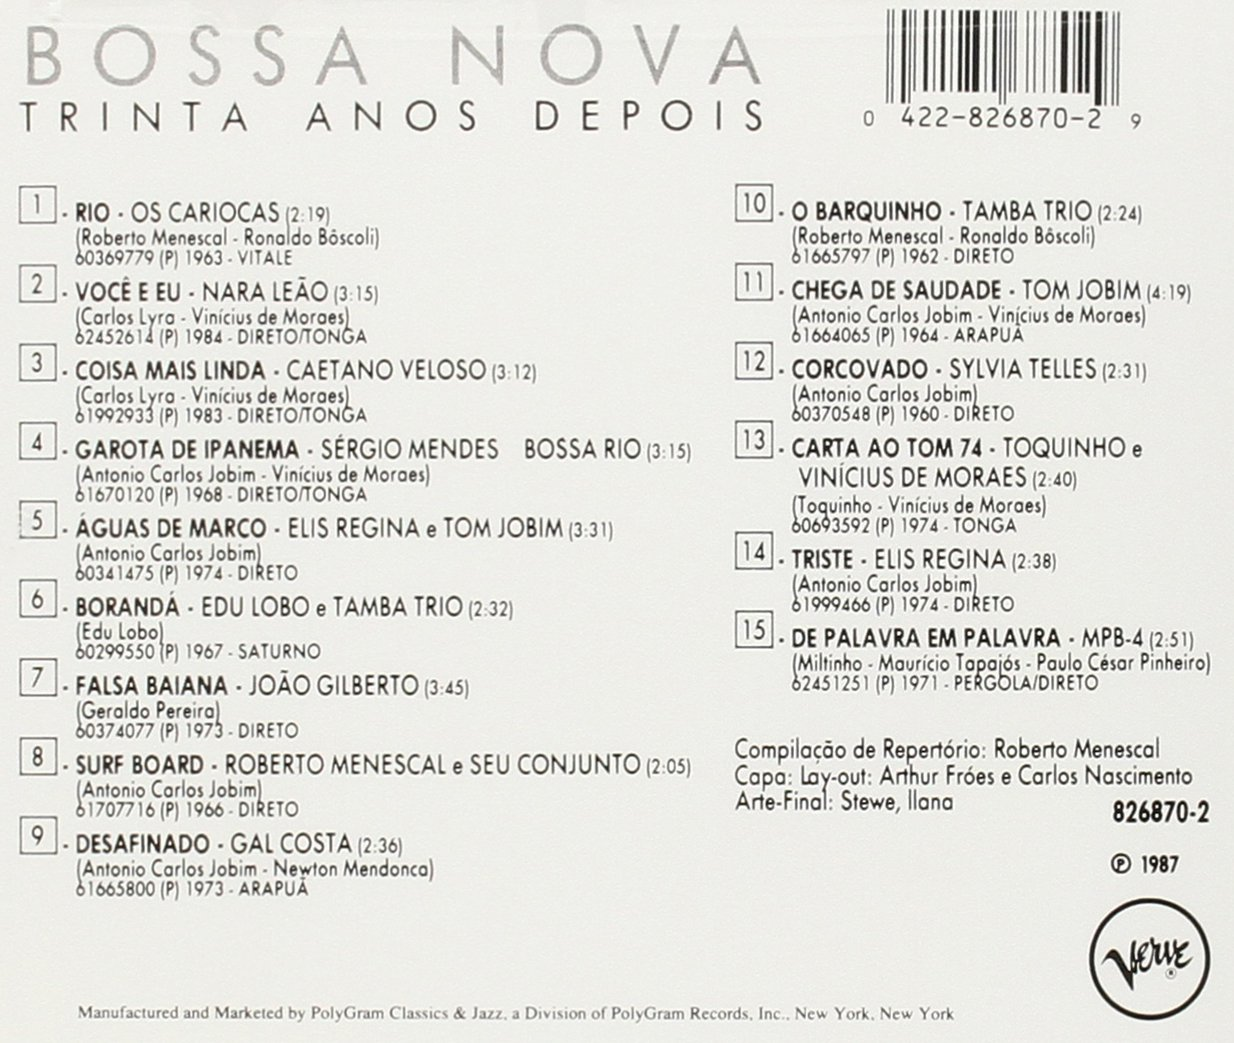 Bossa Nova Trinta Anos Depois (30 Years of Bossa Nova)